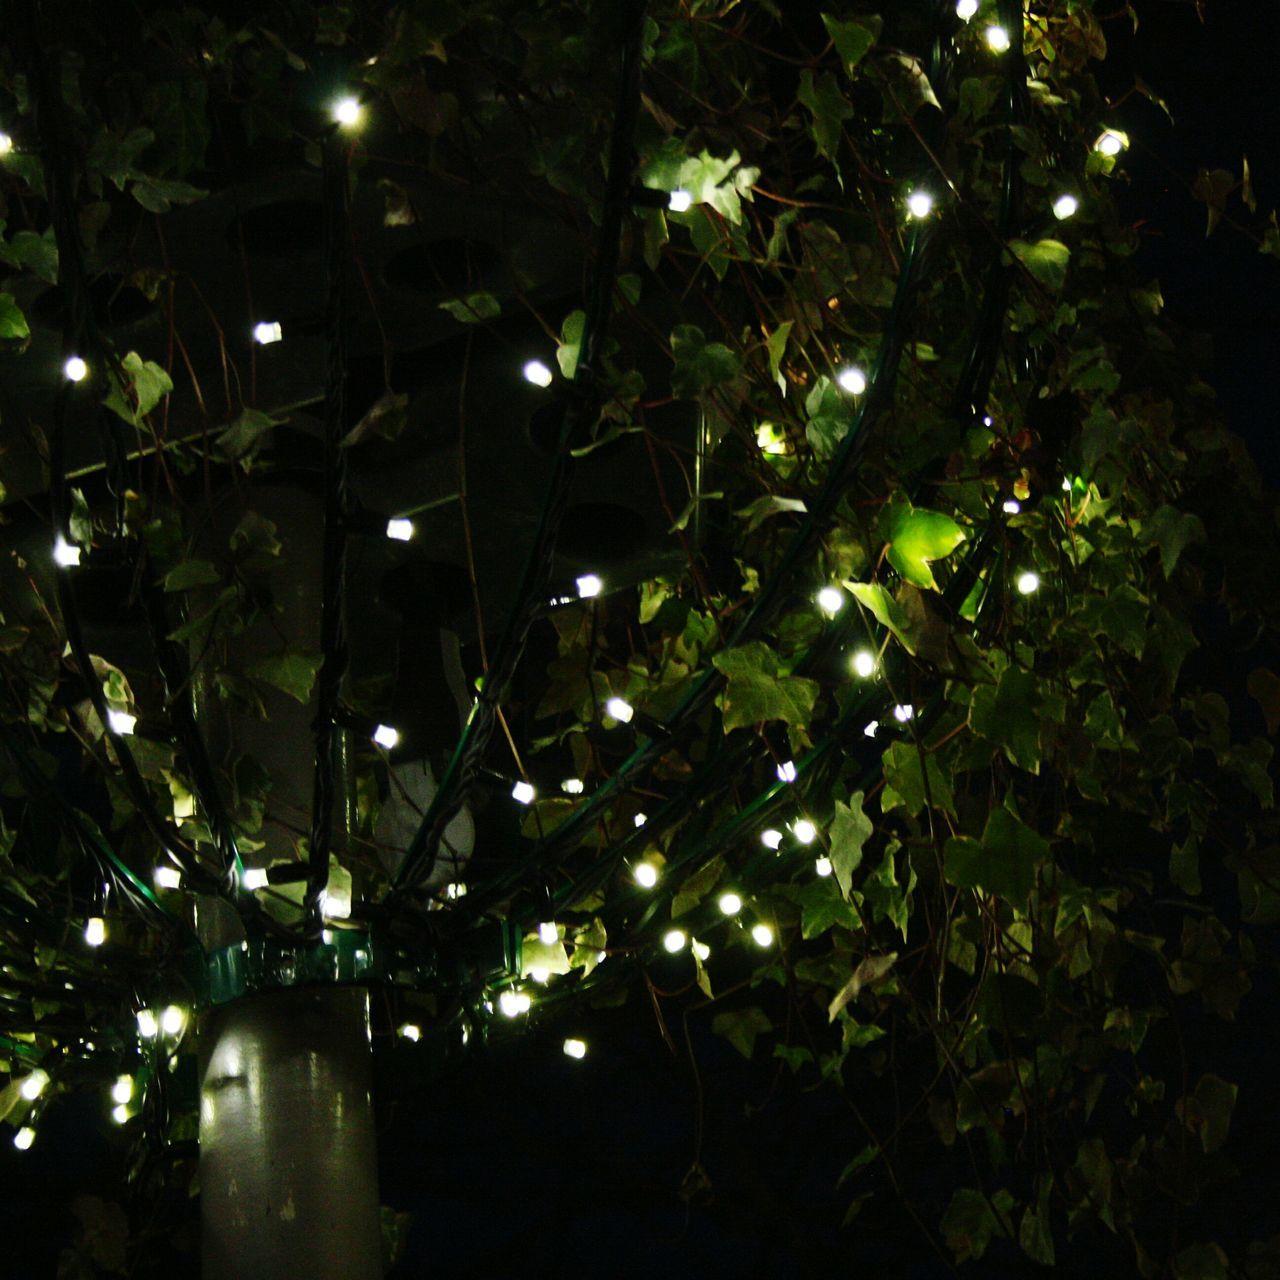 illuminated, night, no people, growth, tree, outdoors, leaf, nature, close-up